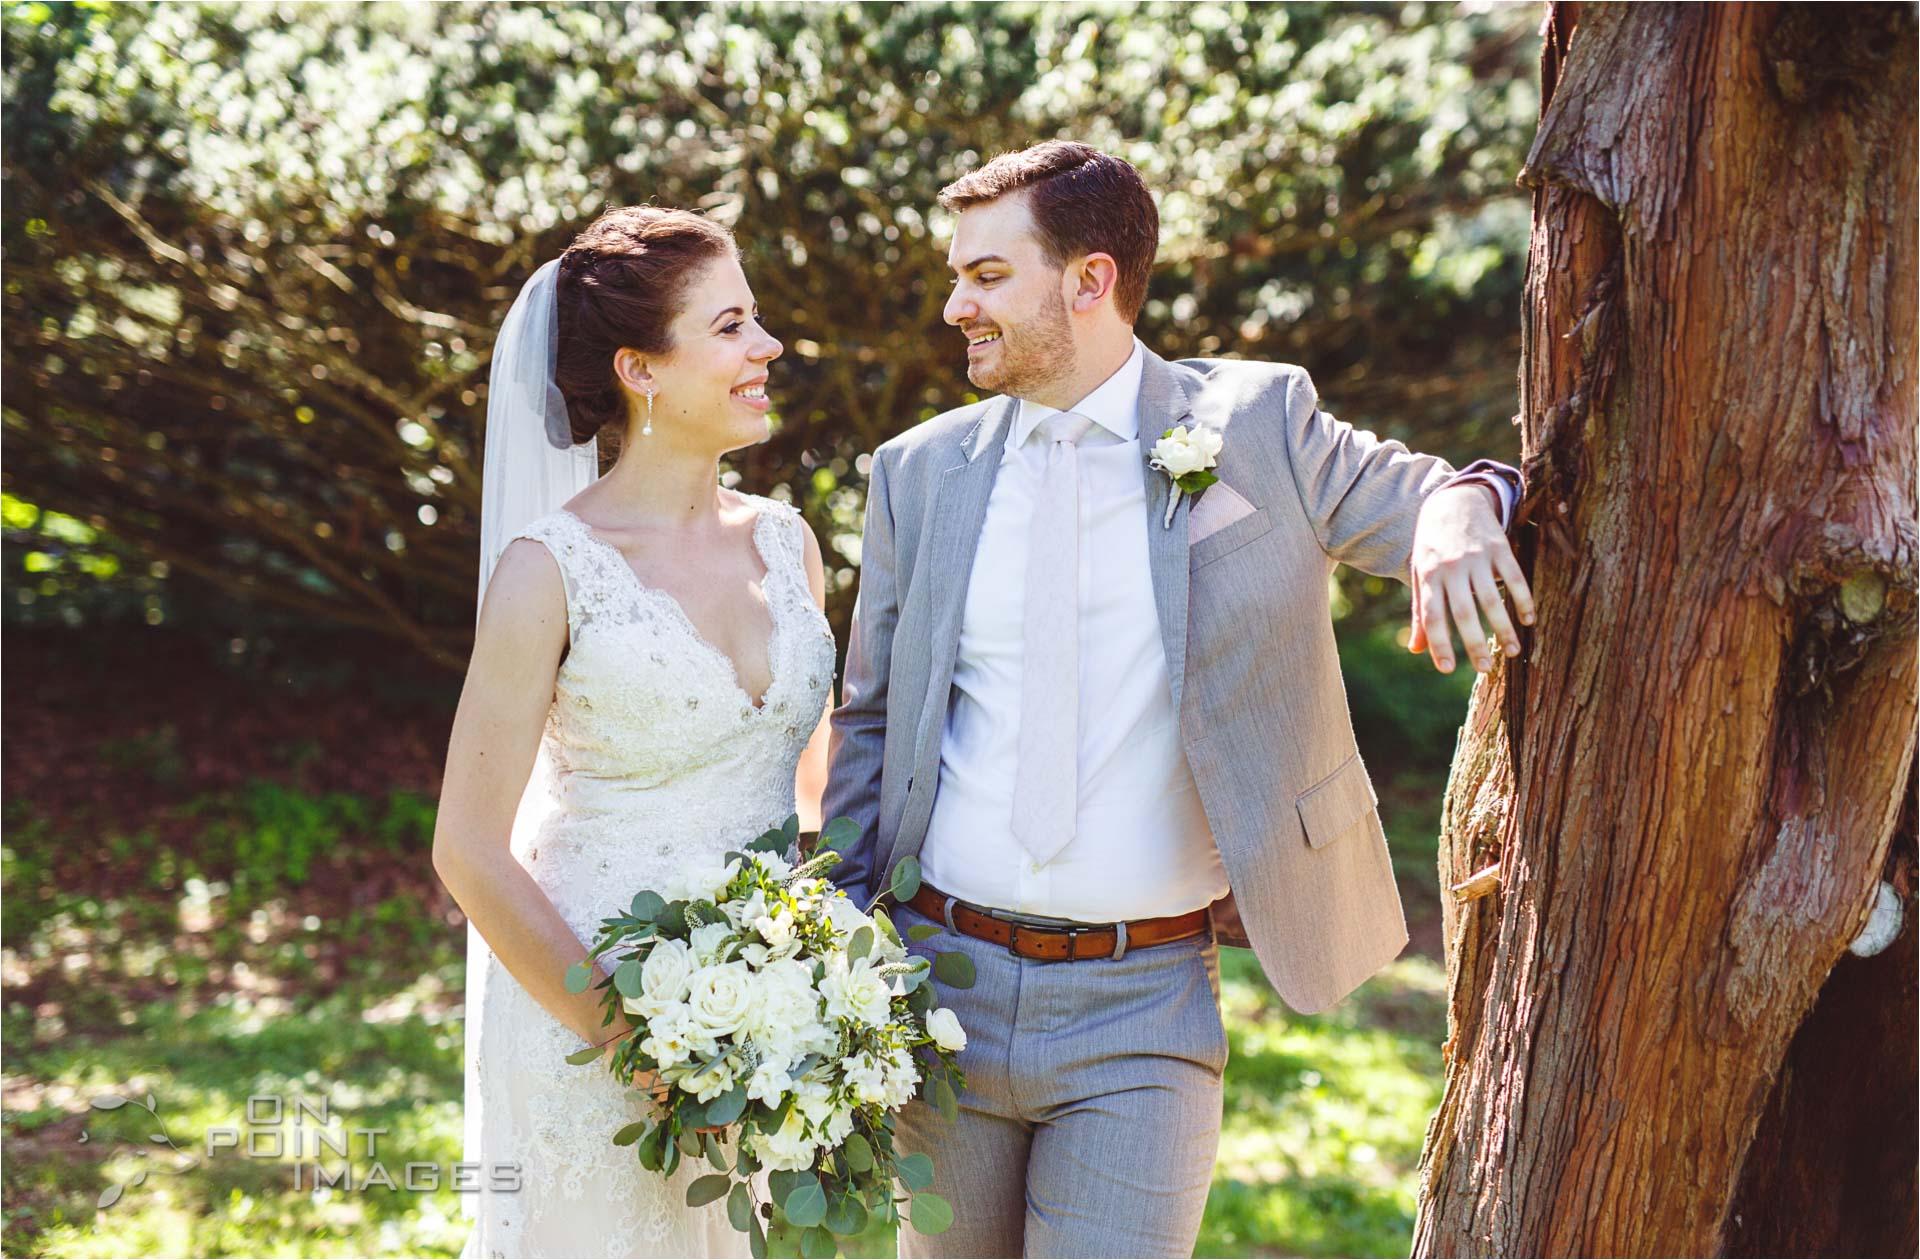 wickham-park-wedding-photographer-ct-14.jpg